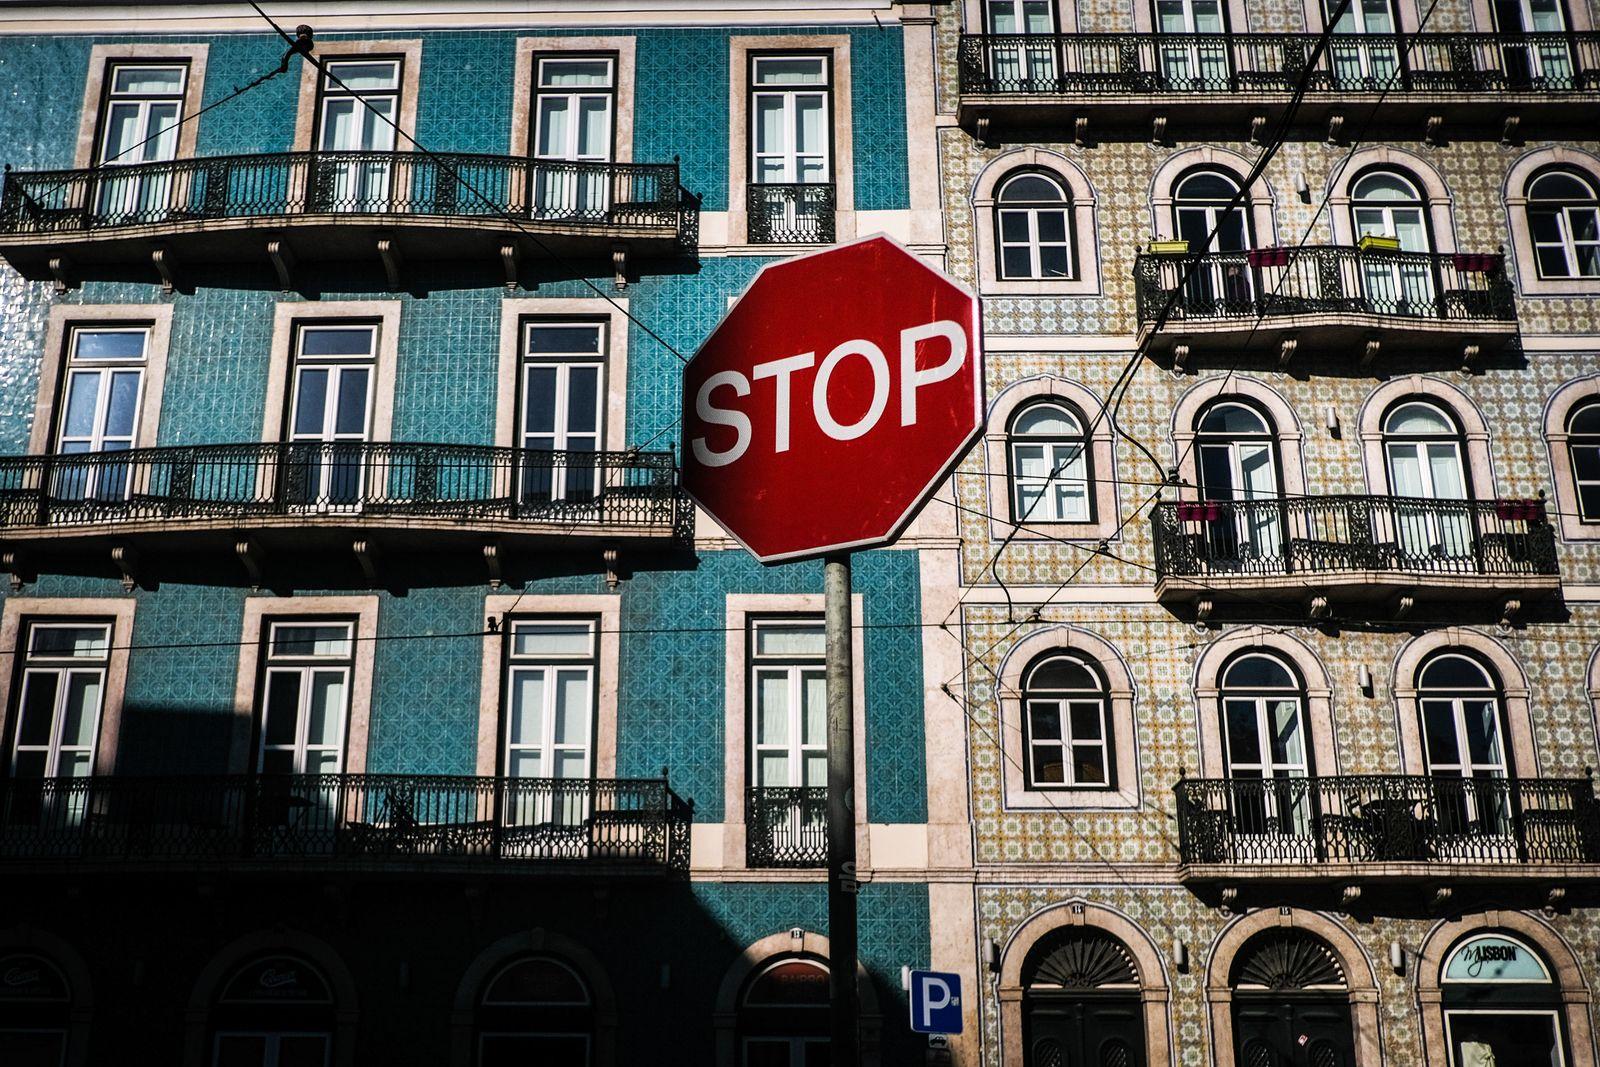 Coronavirus in Portugal, Lisboa - 03 Apr 2020